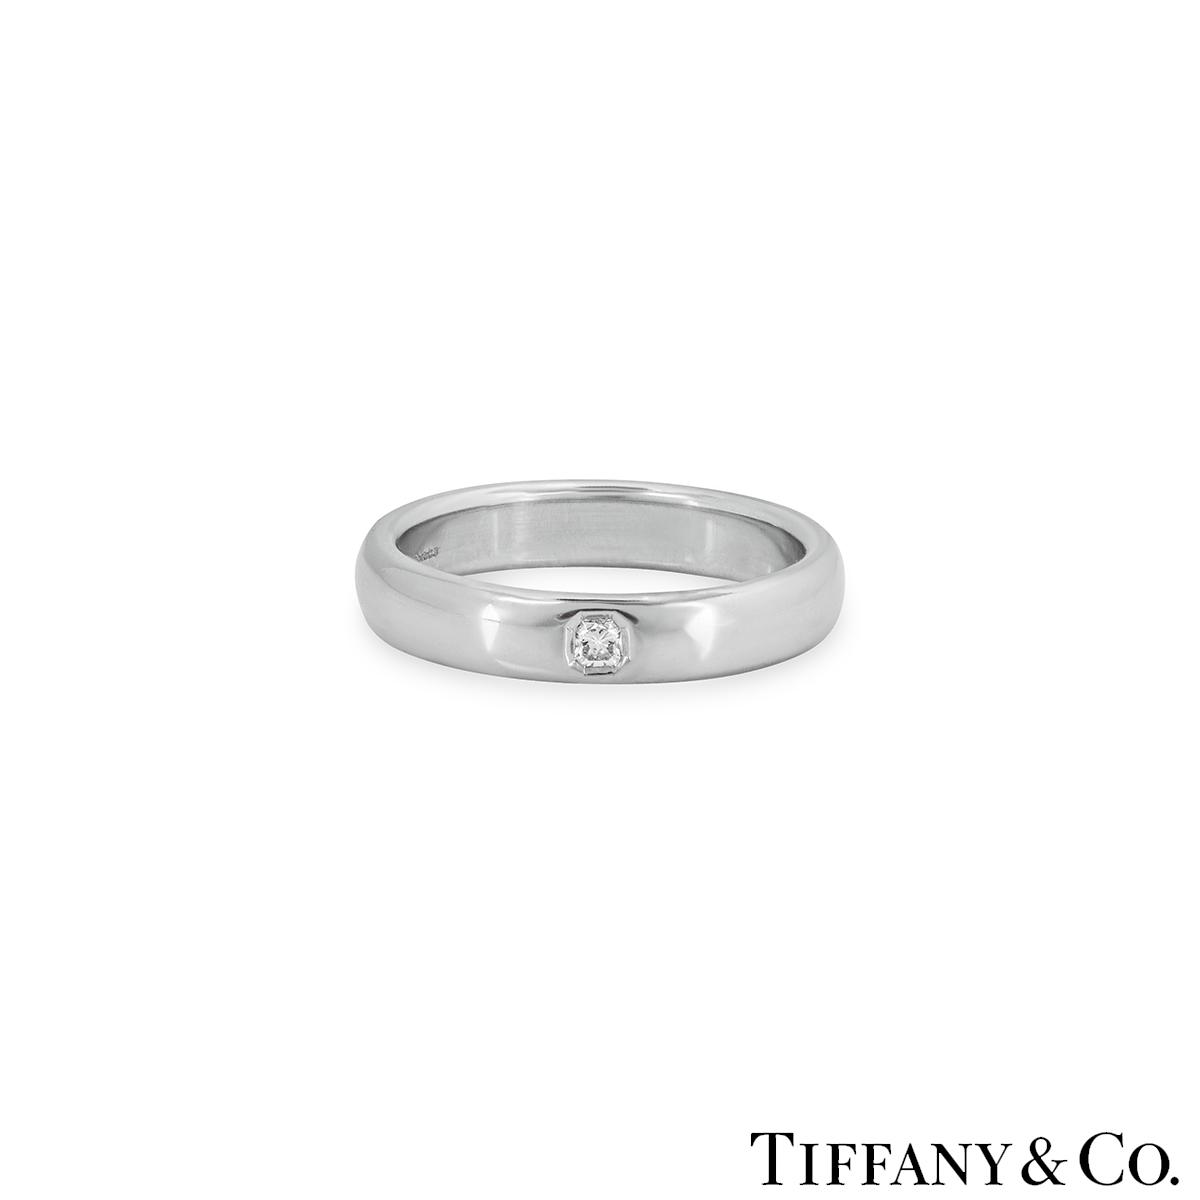 Tiffany Co Platinum Lucida 2mm Wedding Band Ring Sz 8: Tiffany & Co Lucida Diamond Wedding Ring In Platinum